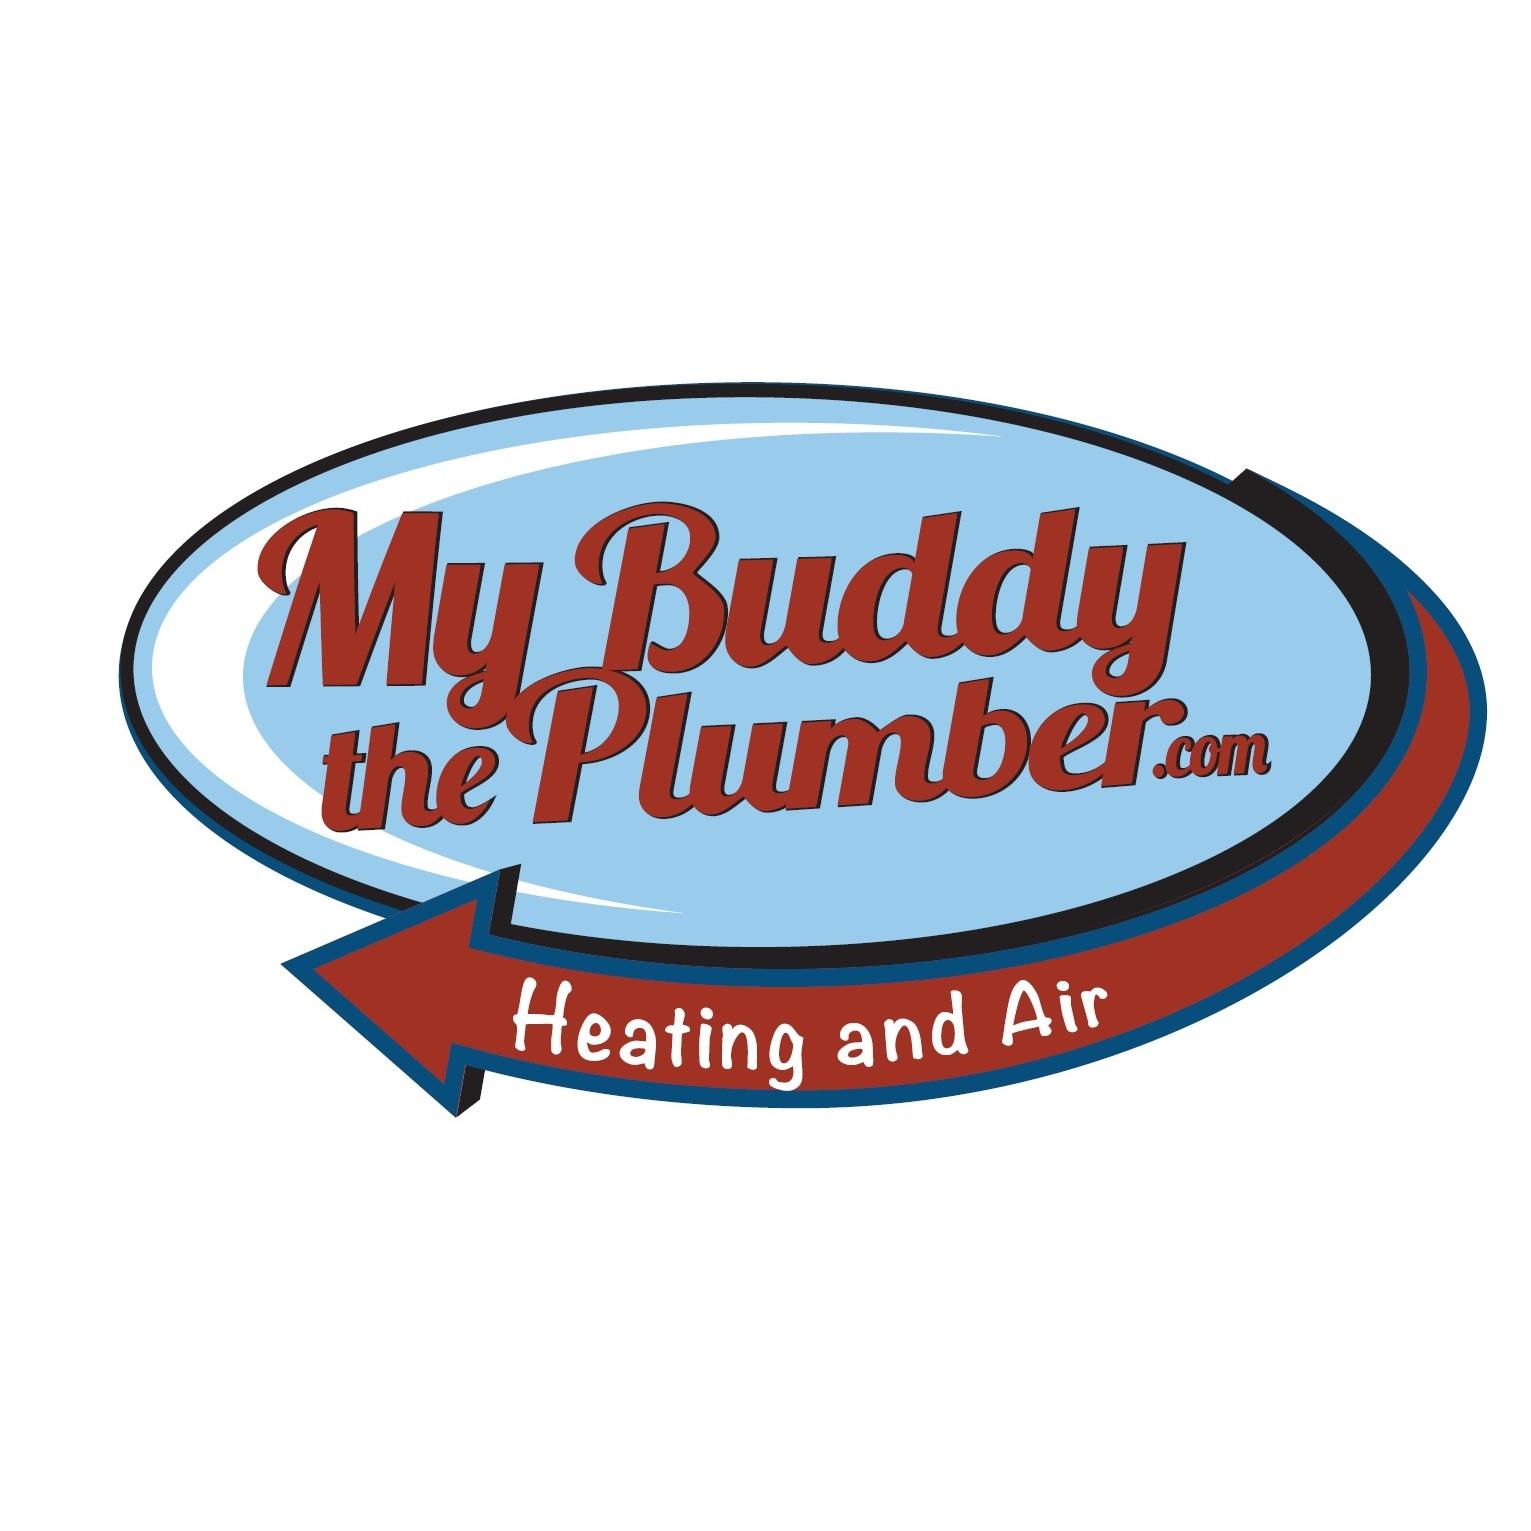 bc img canada vortech plumbing septic duncan plumbers